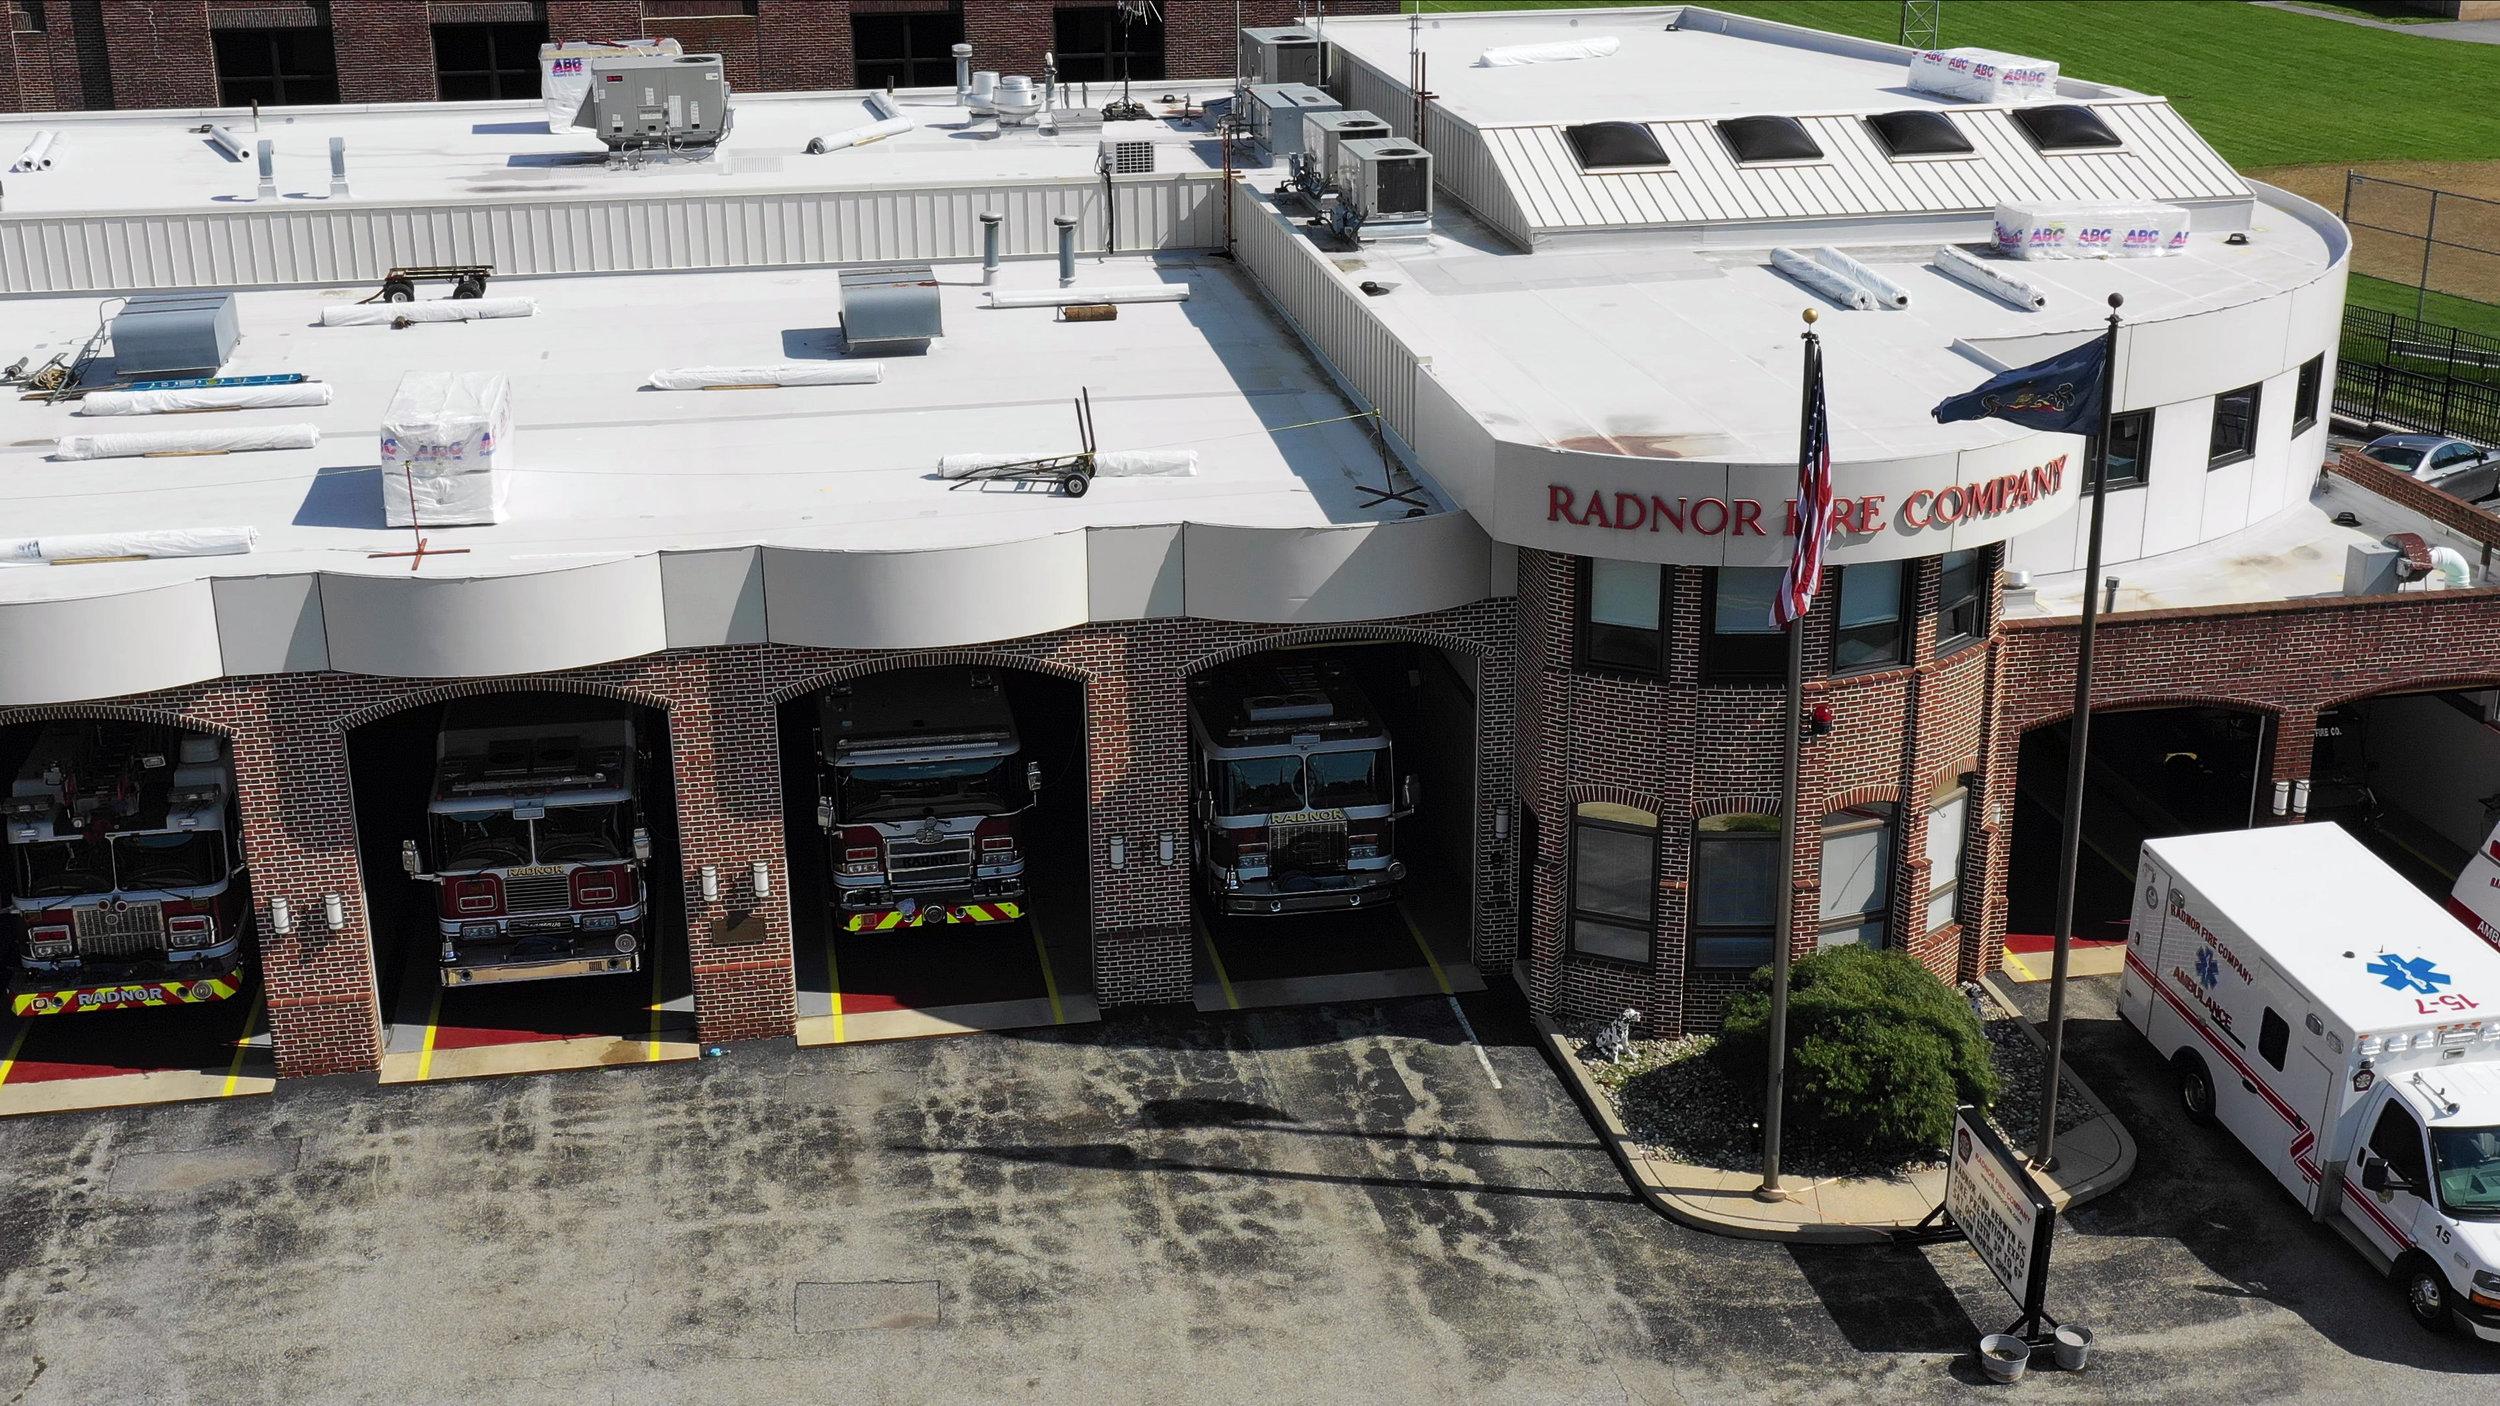 Radnor Fire Station